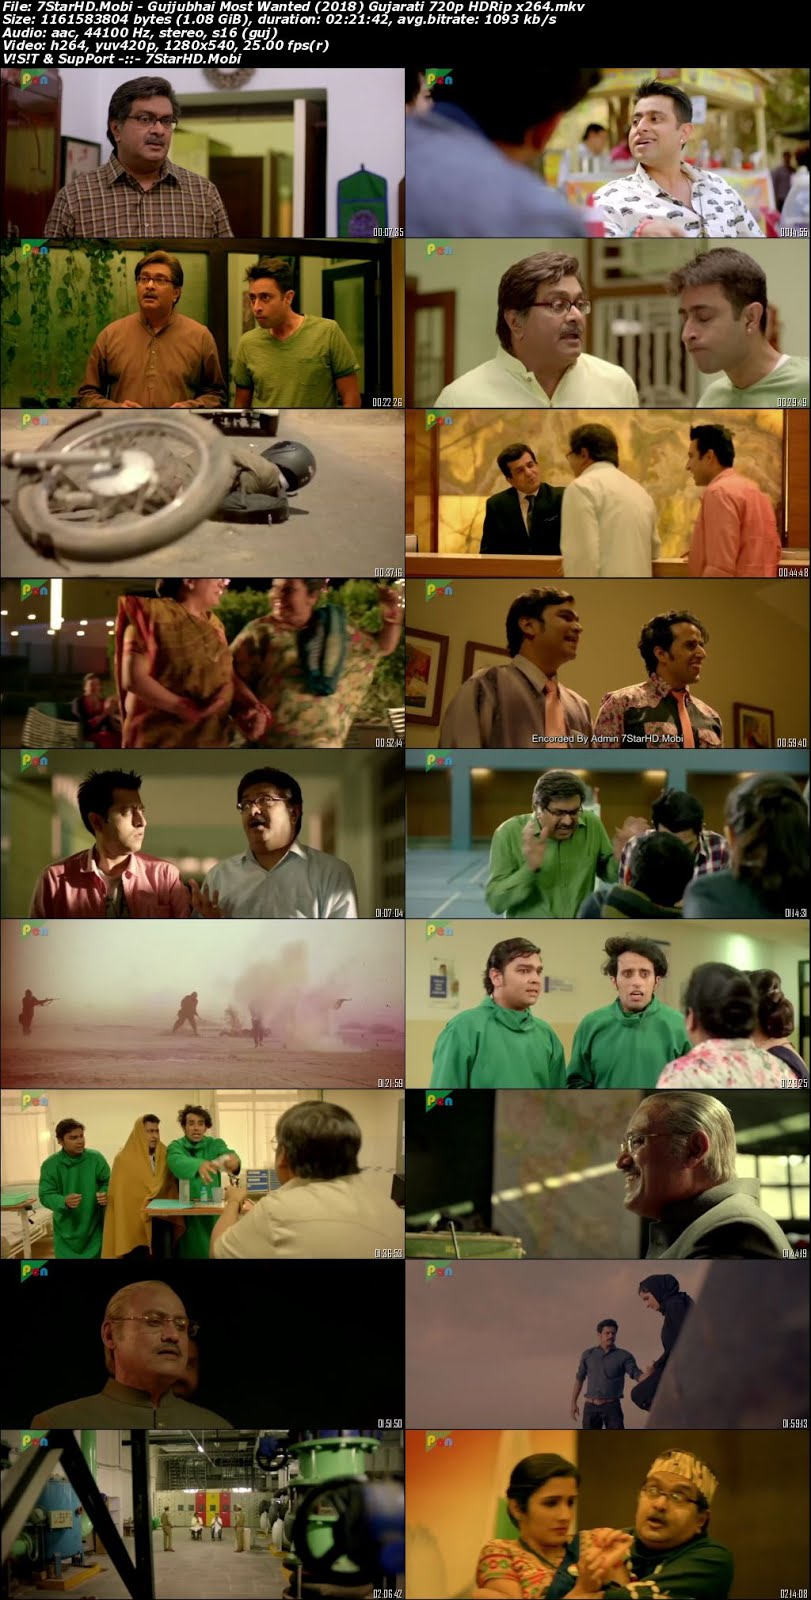 gujjubhai most wanted full gujarati movie download in hd